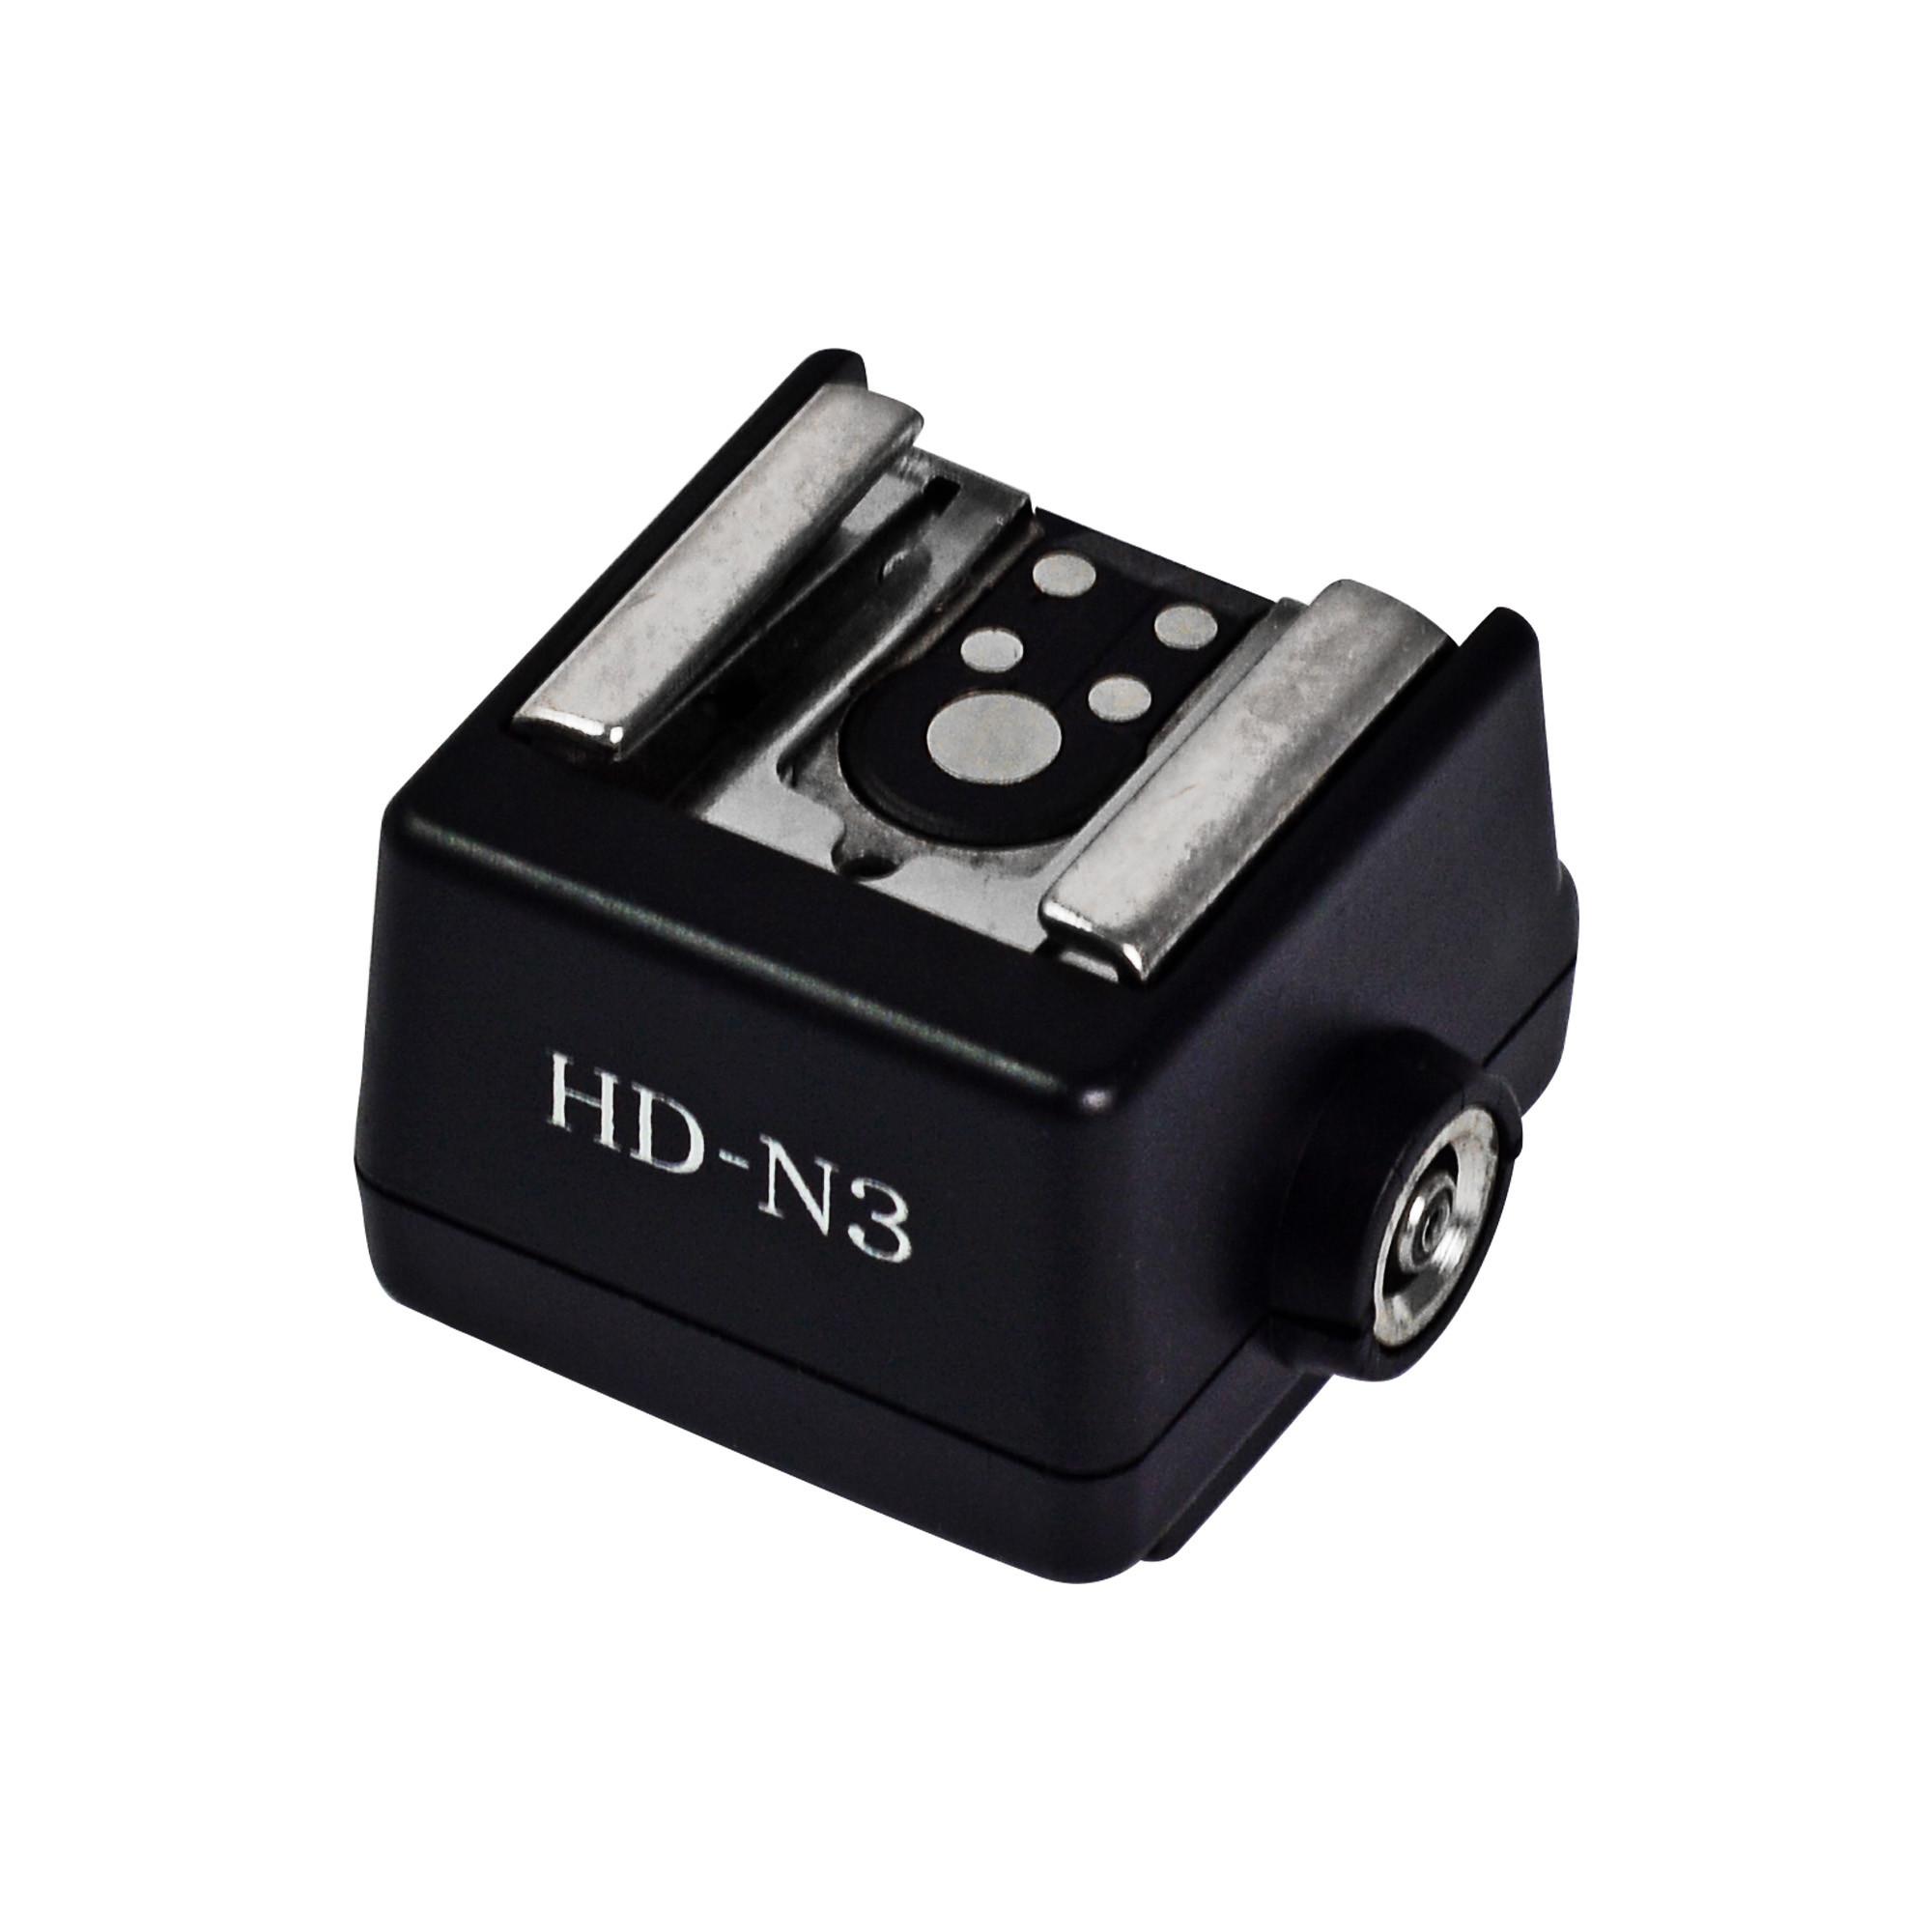 b6bba4c09a HD-N3 Hot Shoe Adapter High-quality Flash Hot Shoe PC Sync Socket ...